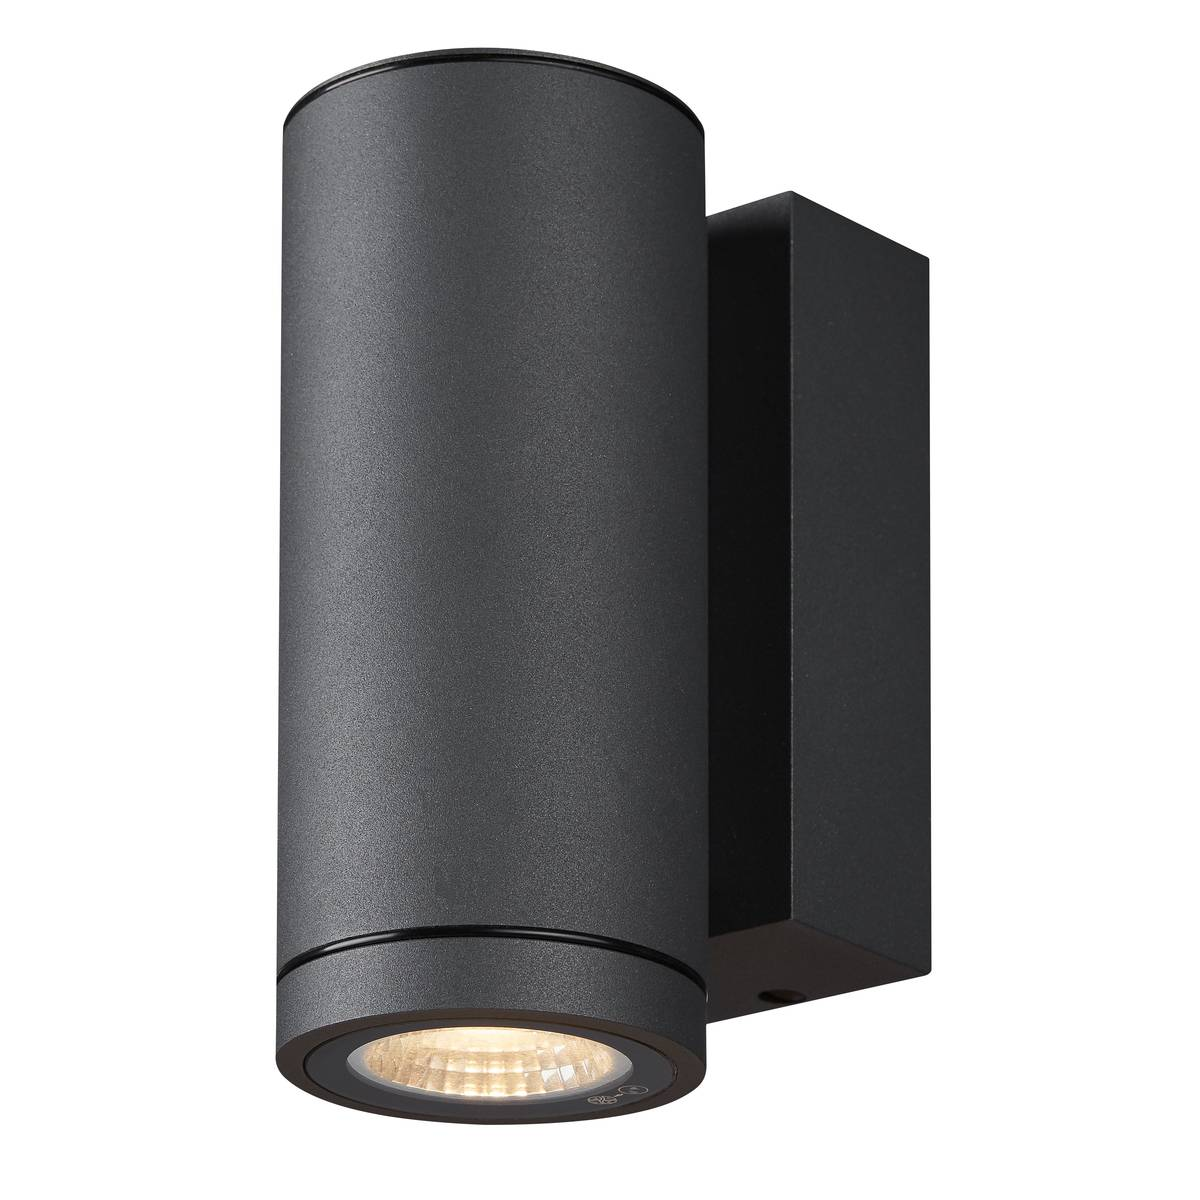 SLV buiten wandlamp Enola Round S - antraciet